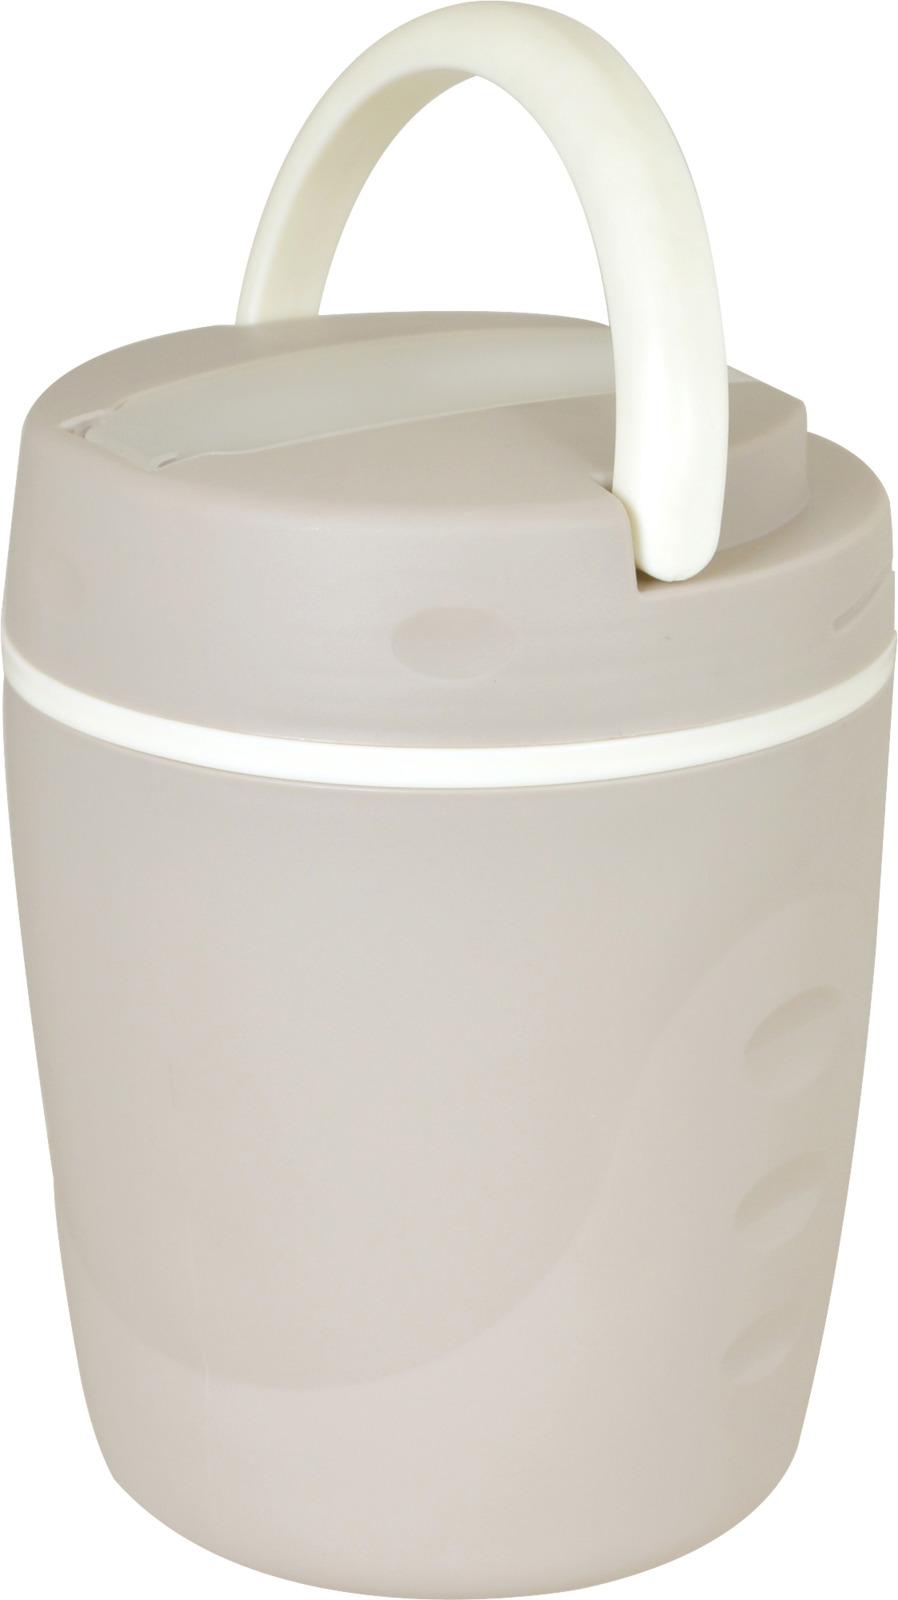 Термос-контейнер Mallony, цвет: белый, 1 л контейнер пластиковый 1 8 л comboez контейнер пластиковый 1 8 л